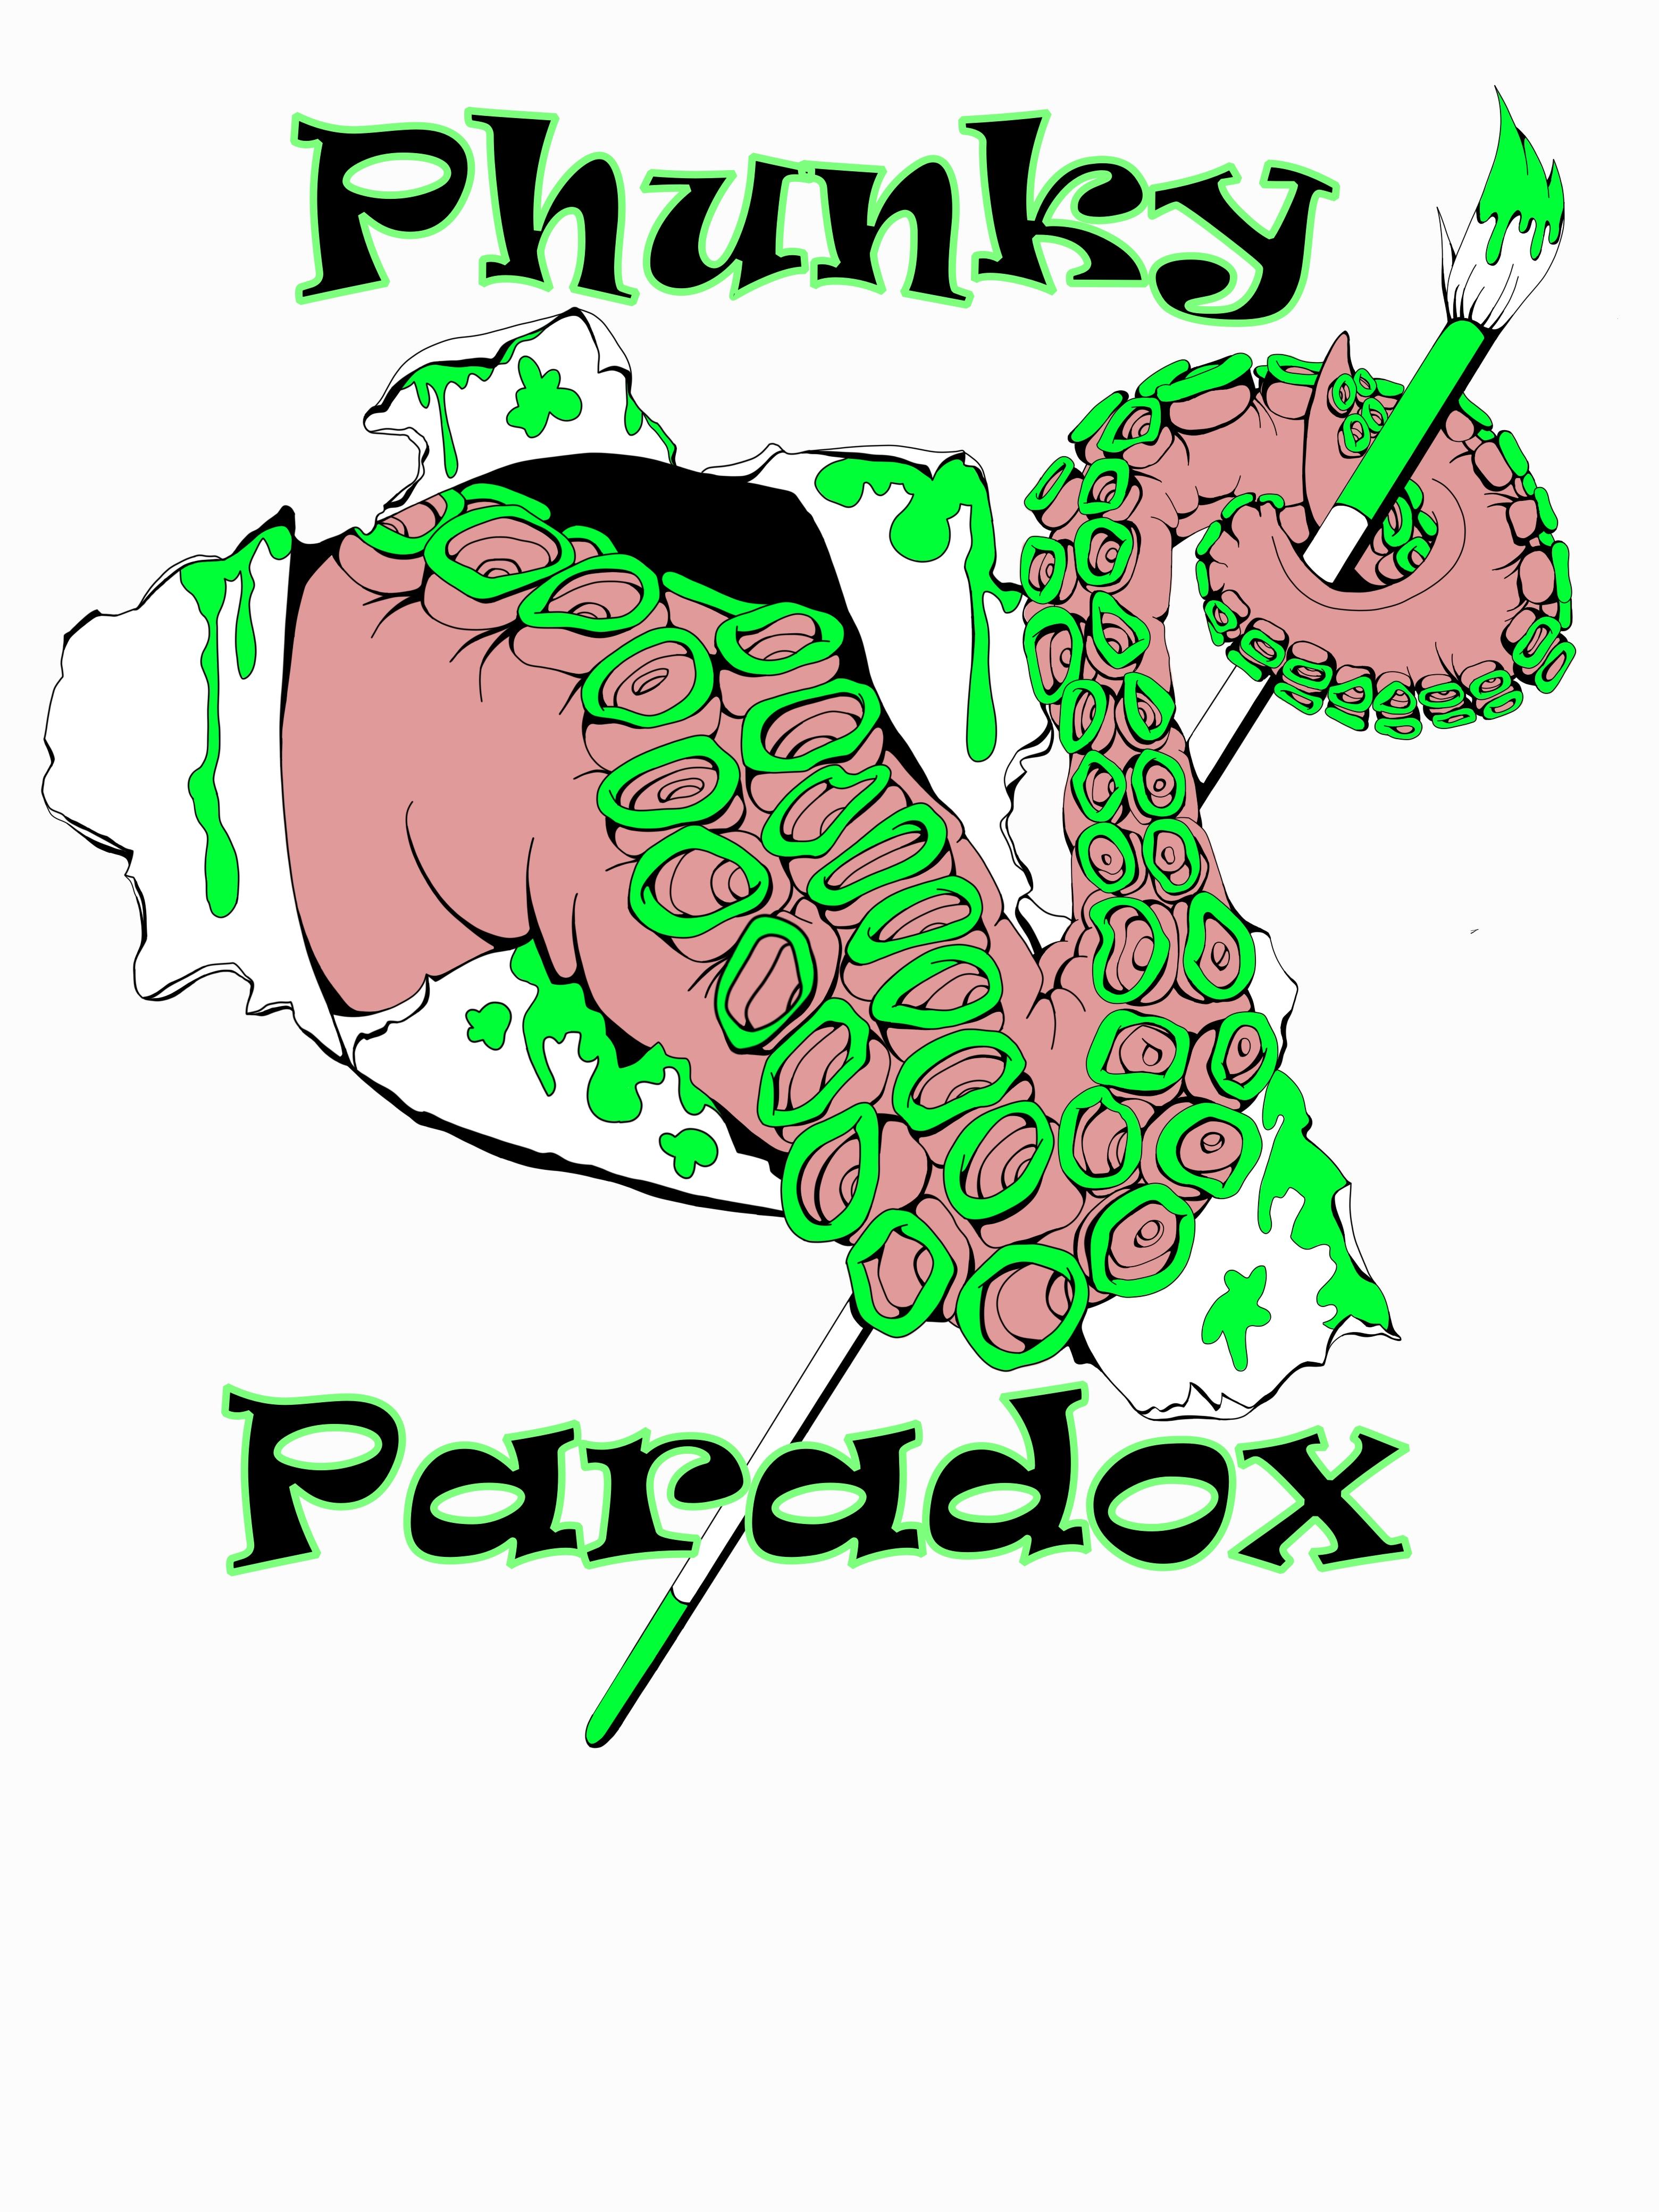 Phunky Paradox Logo